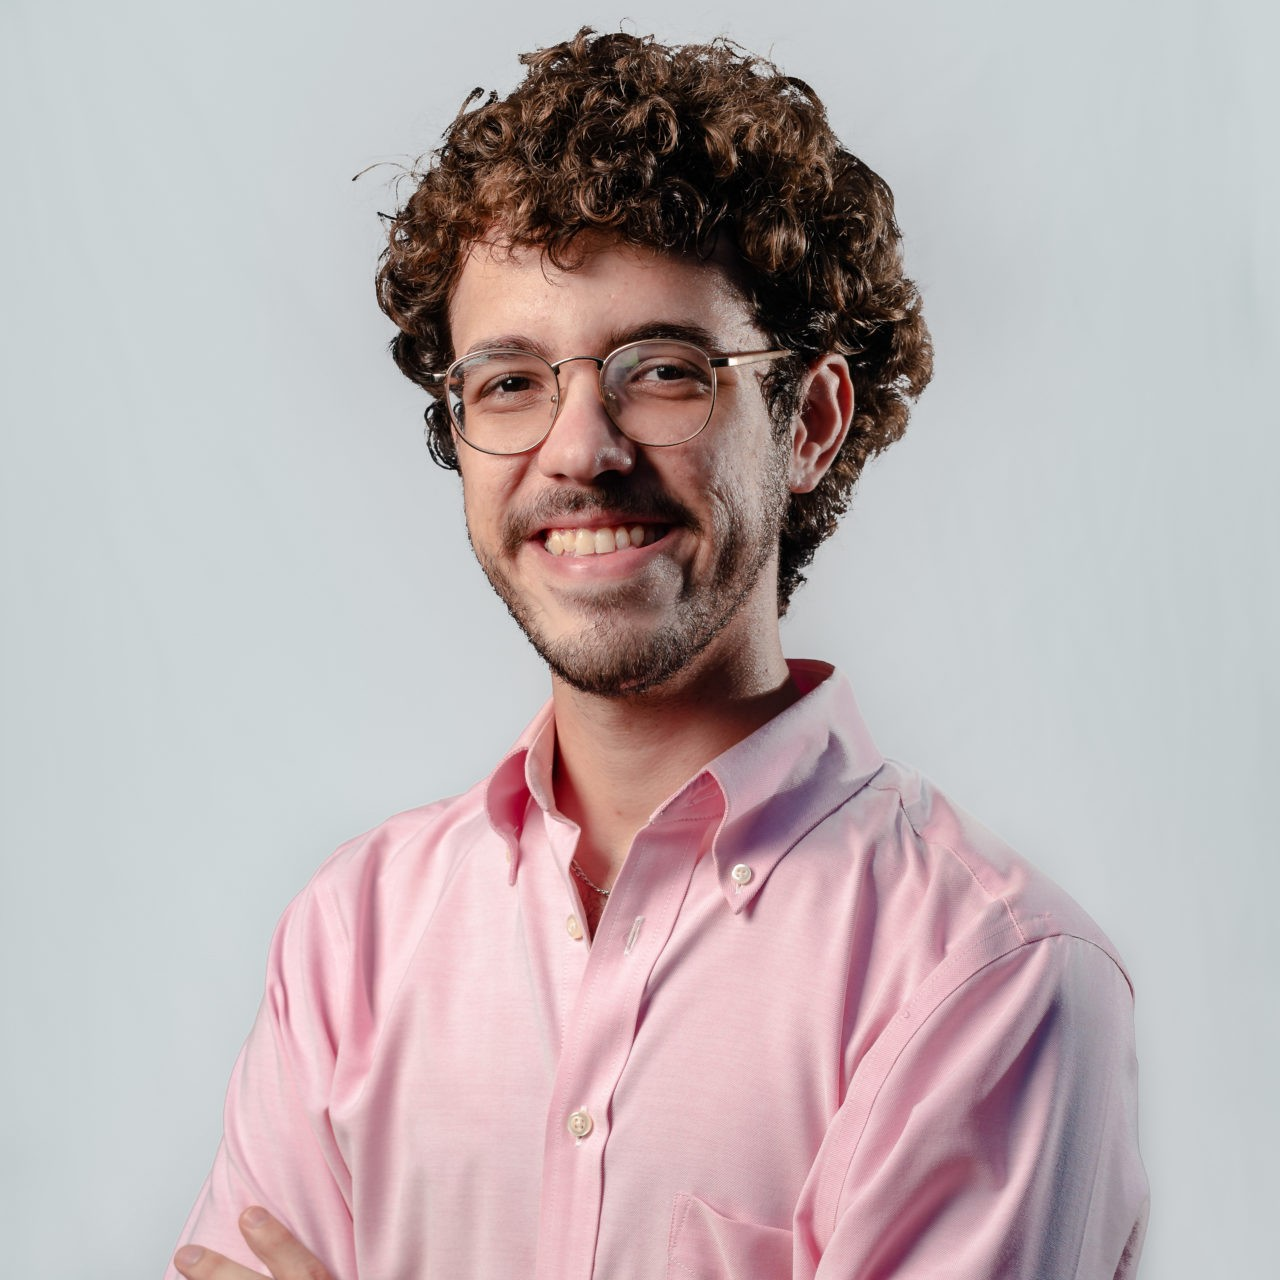 Luis D. Alfaro Pérez